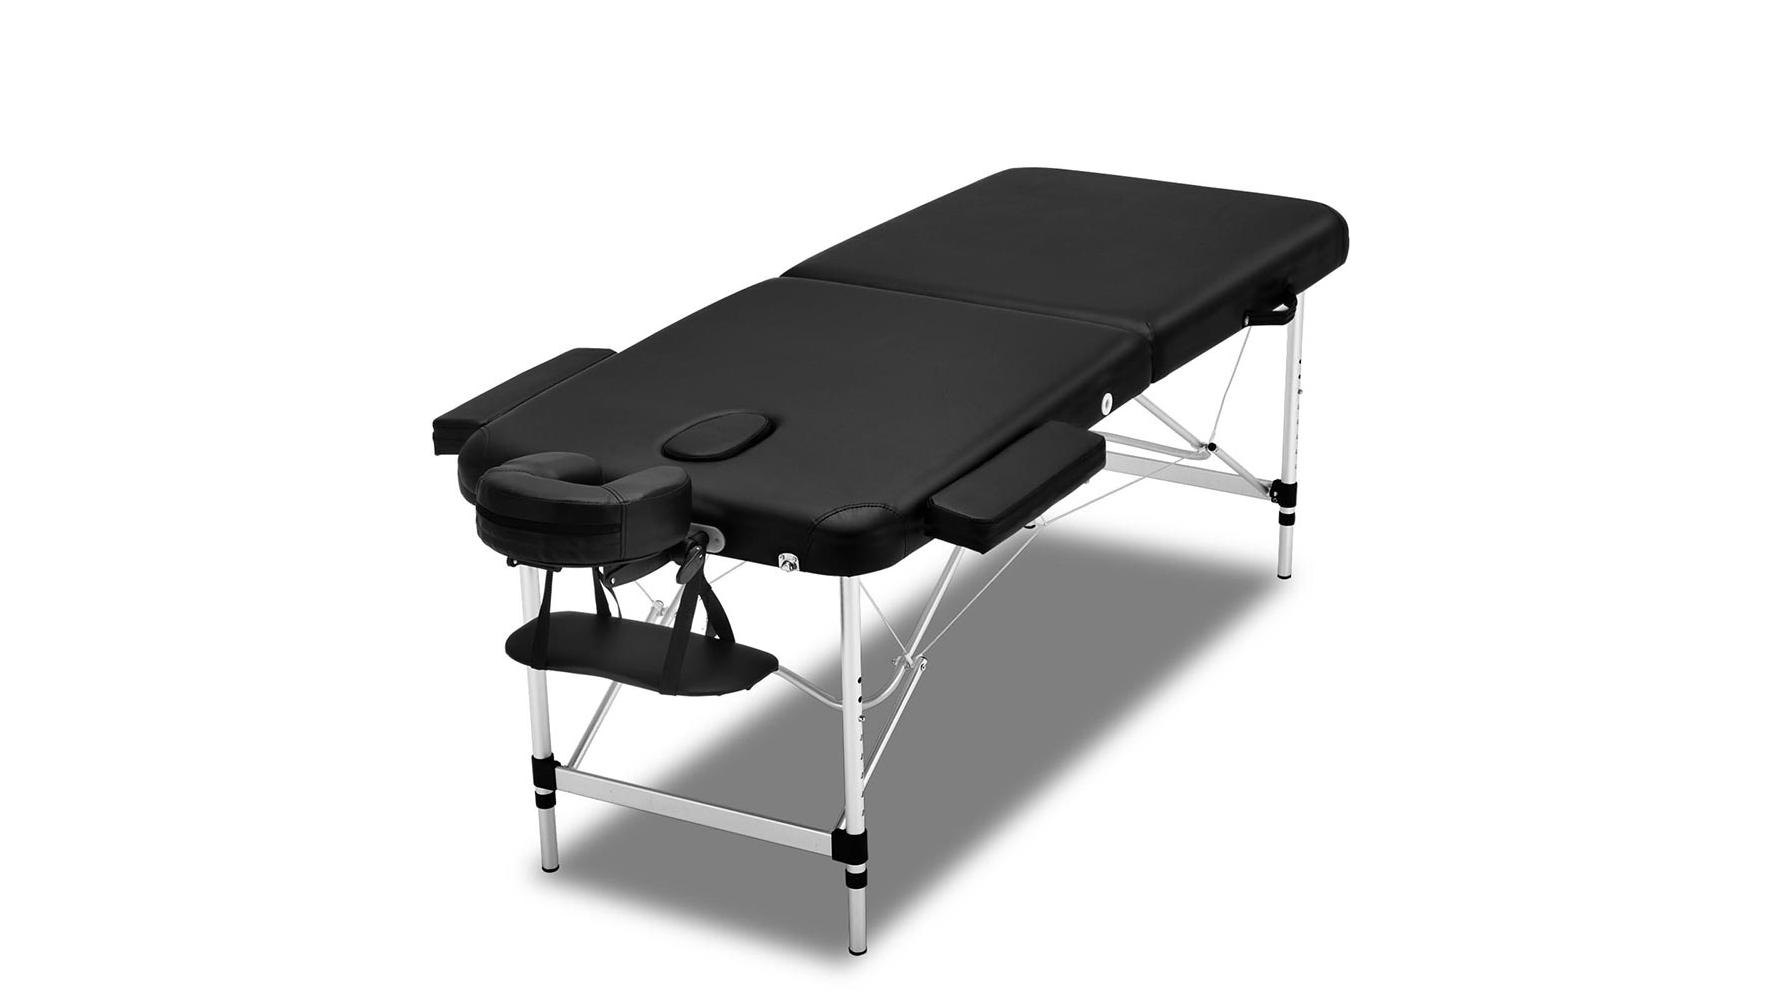 Zenses Portable Aluminium 10 Fold Massage Table - Black